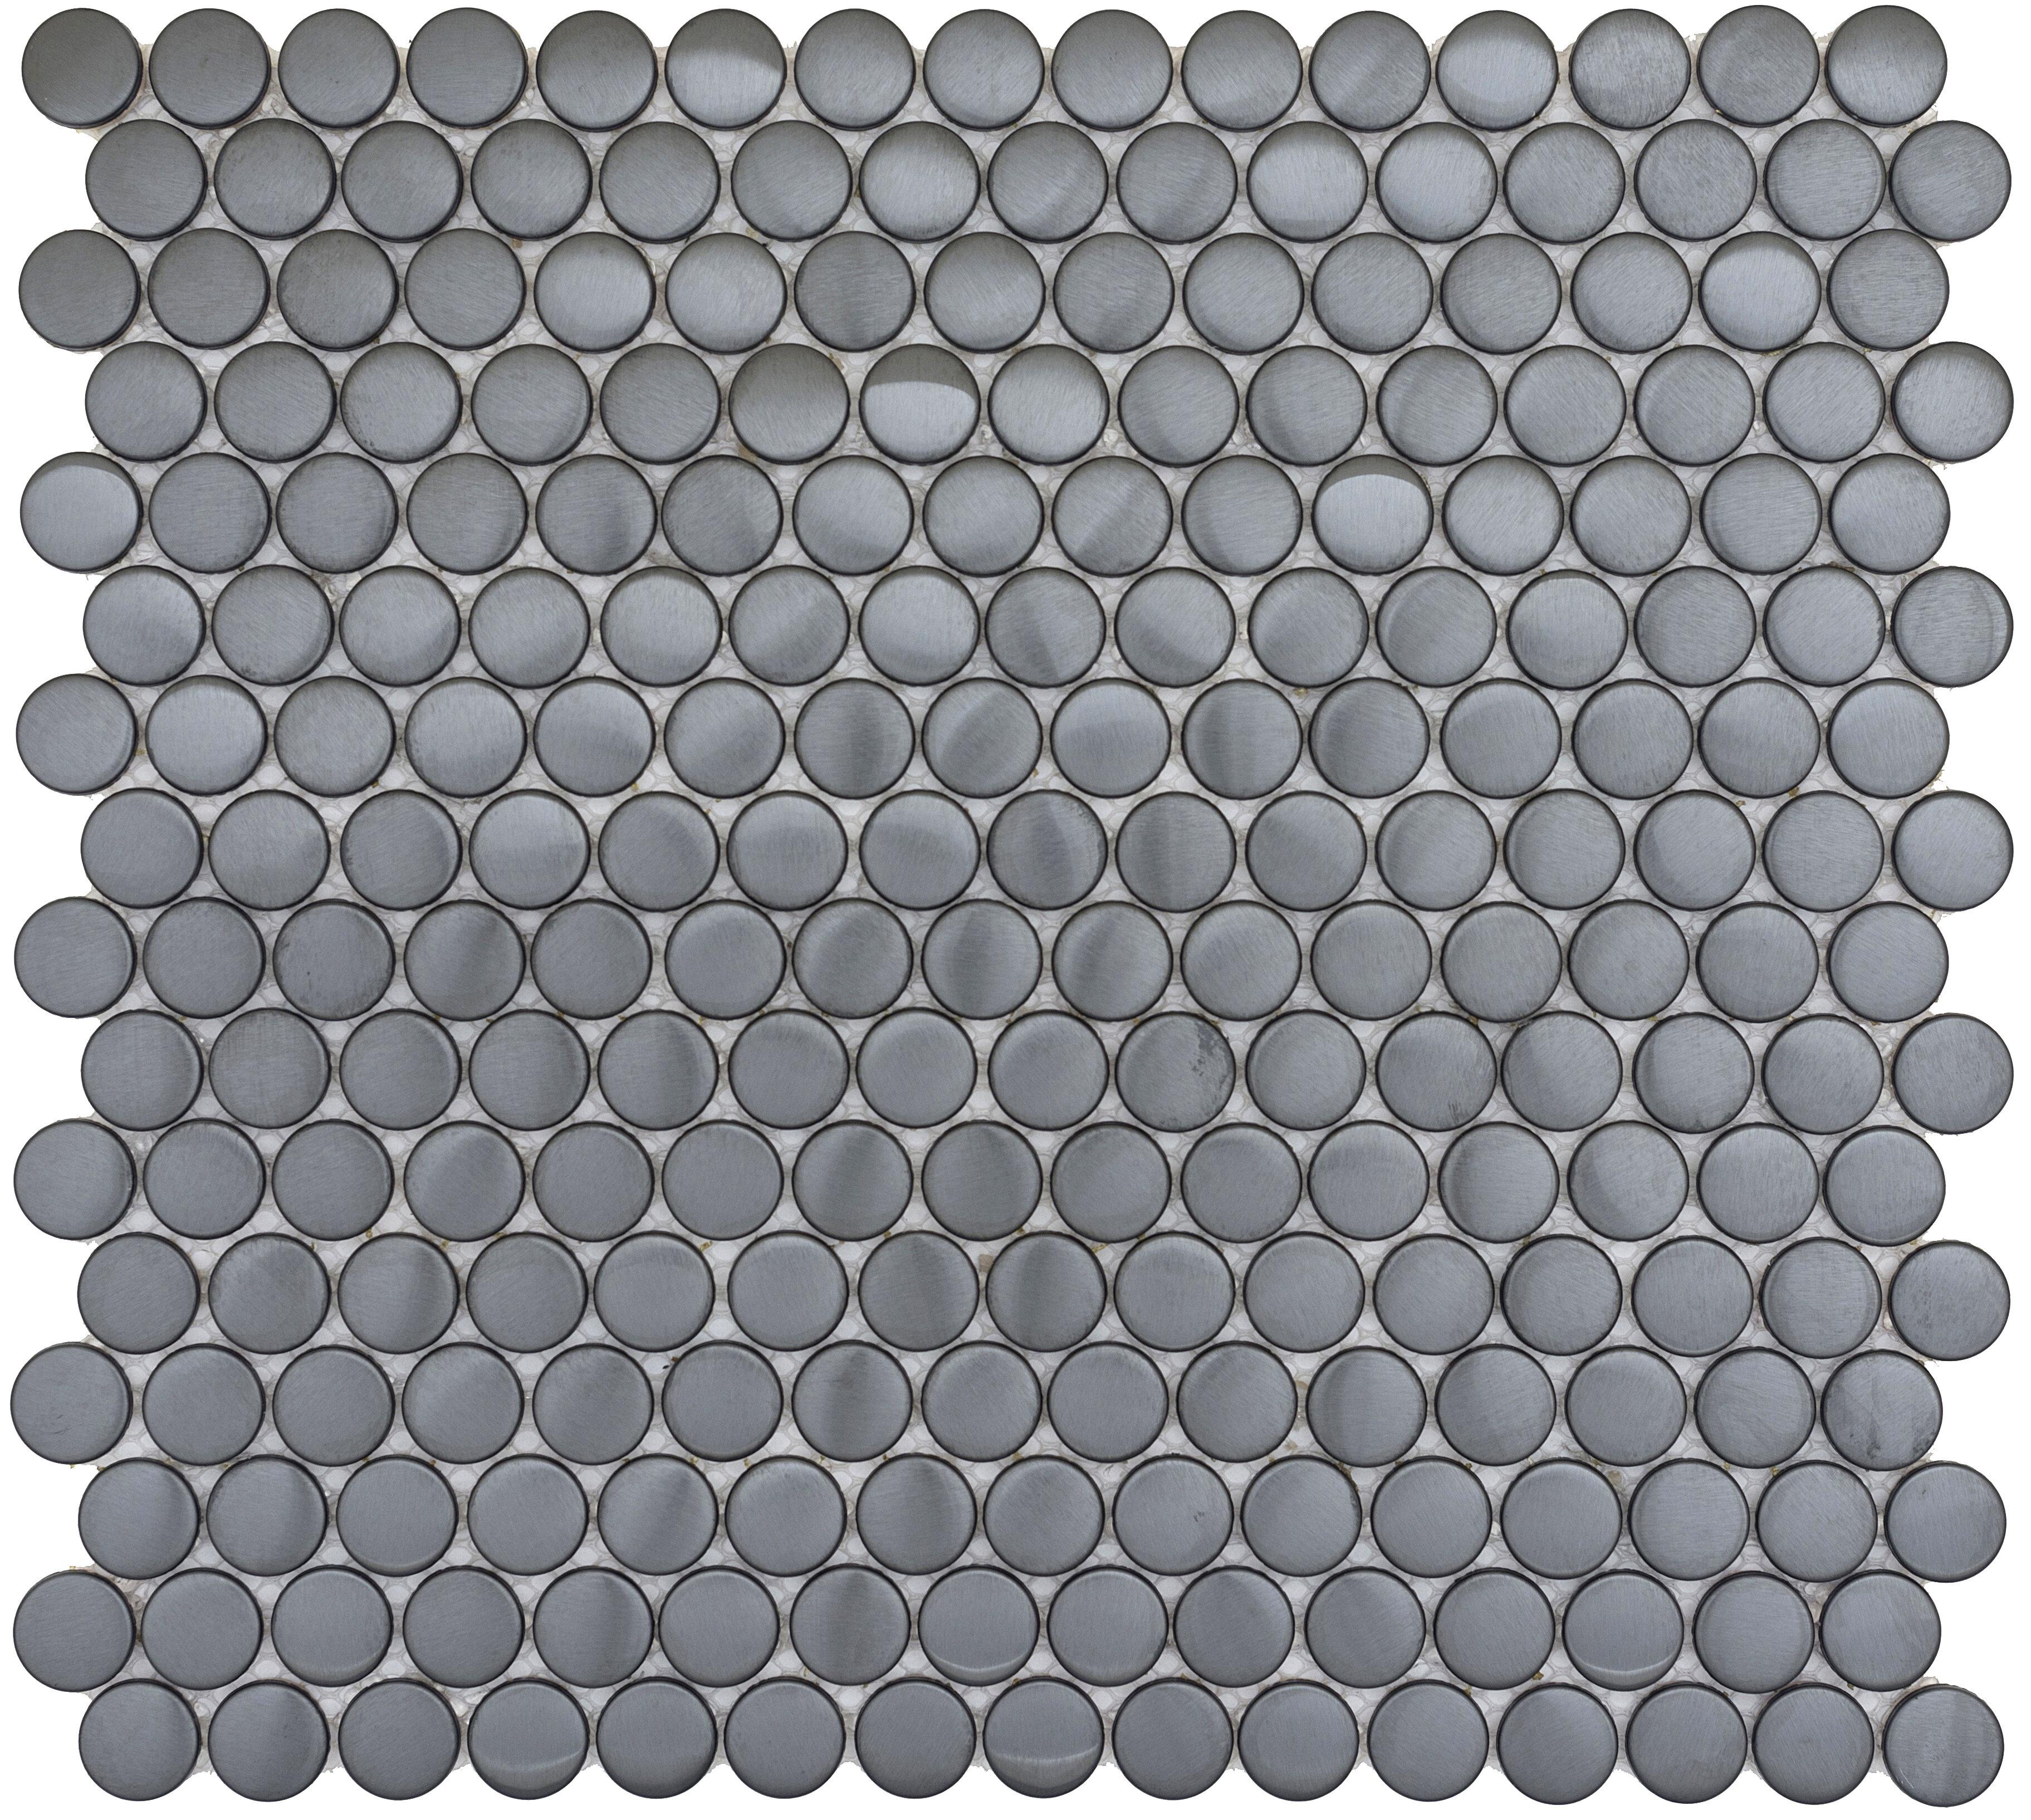 Emser Tile Gleam 12 X 12 Metal Over Ceramic Penny Mosaic Tile In